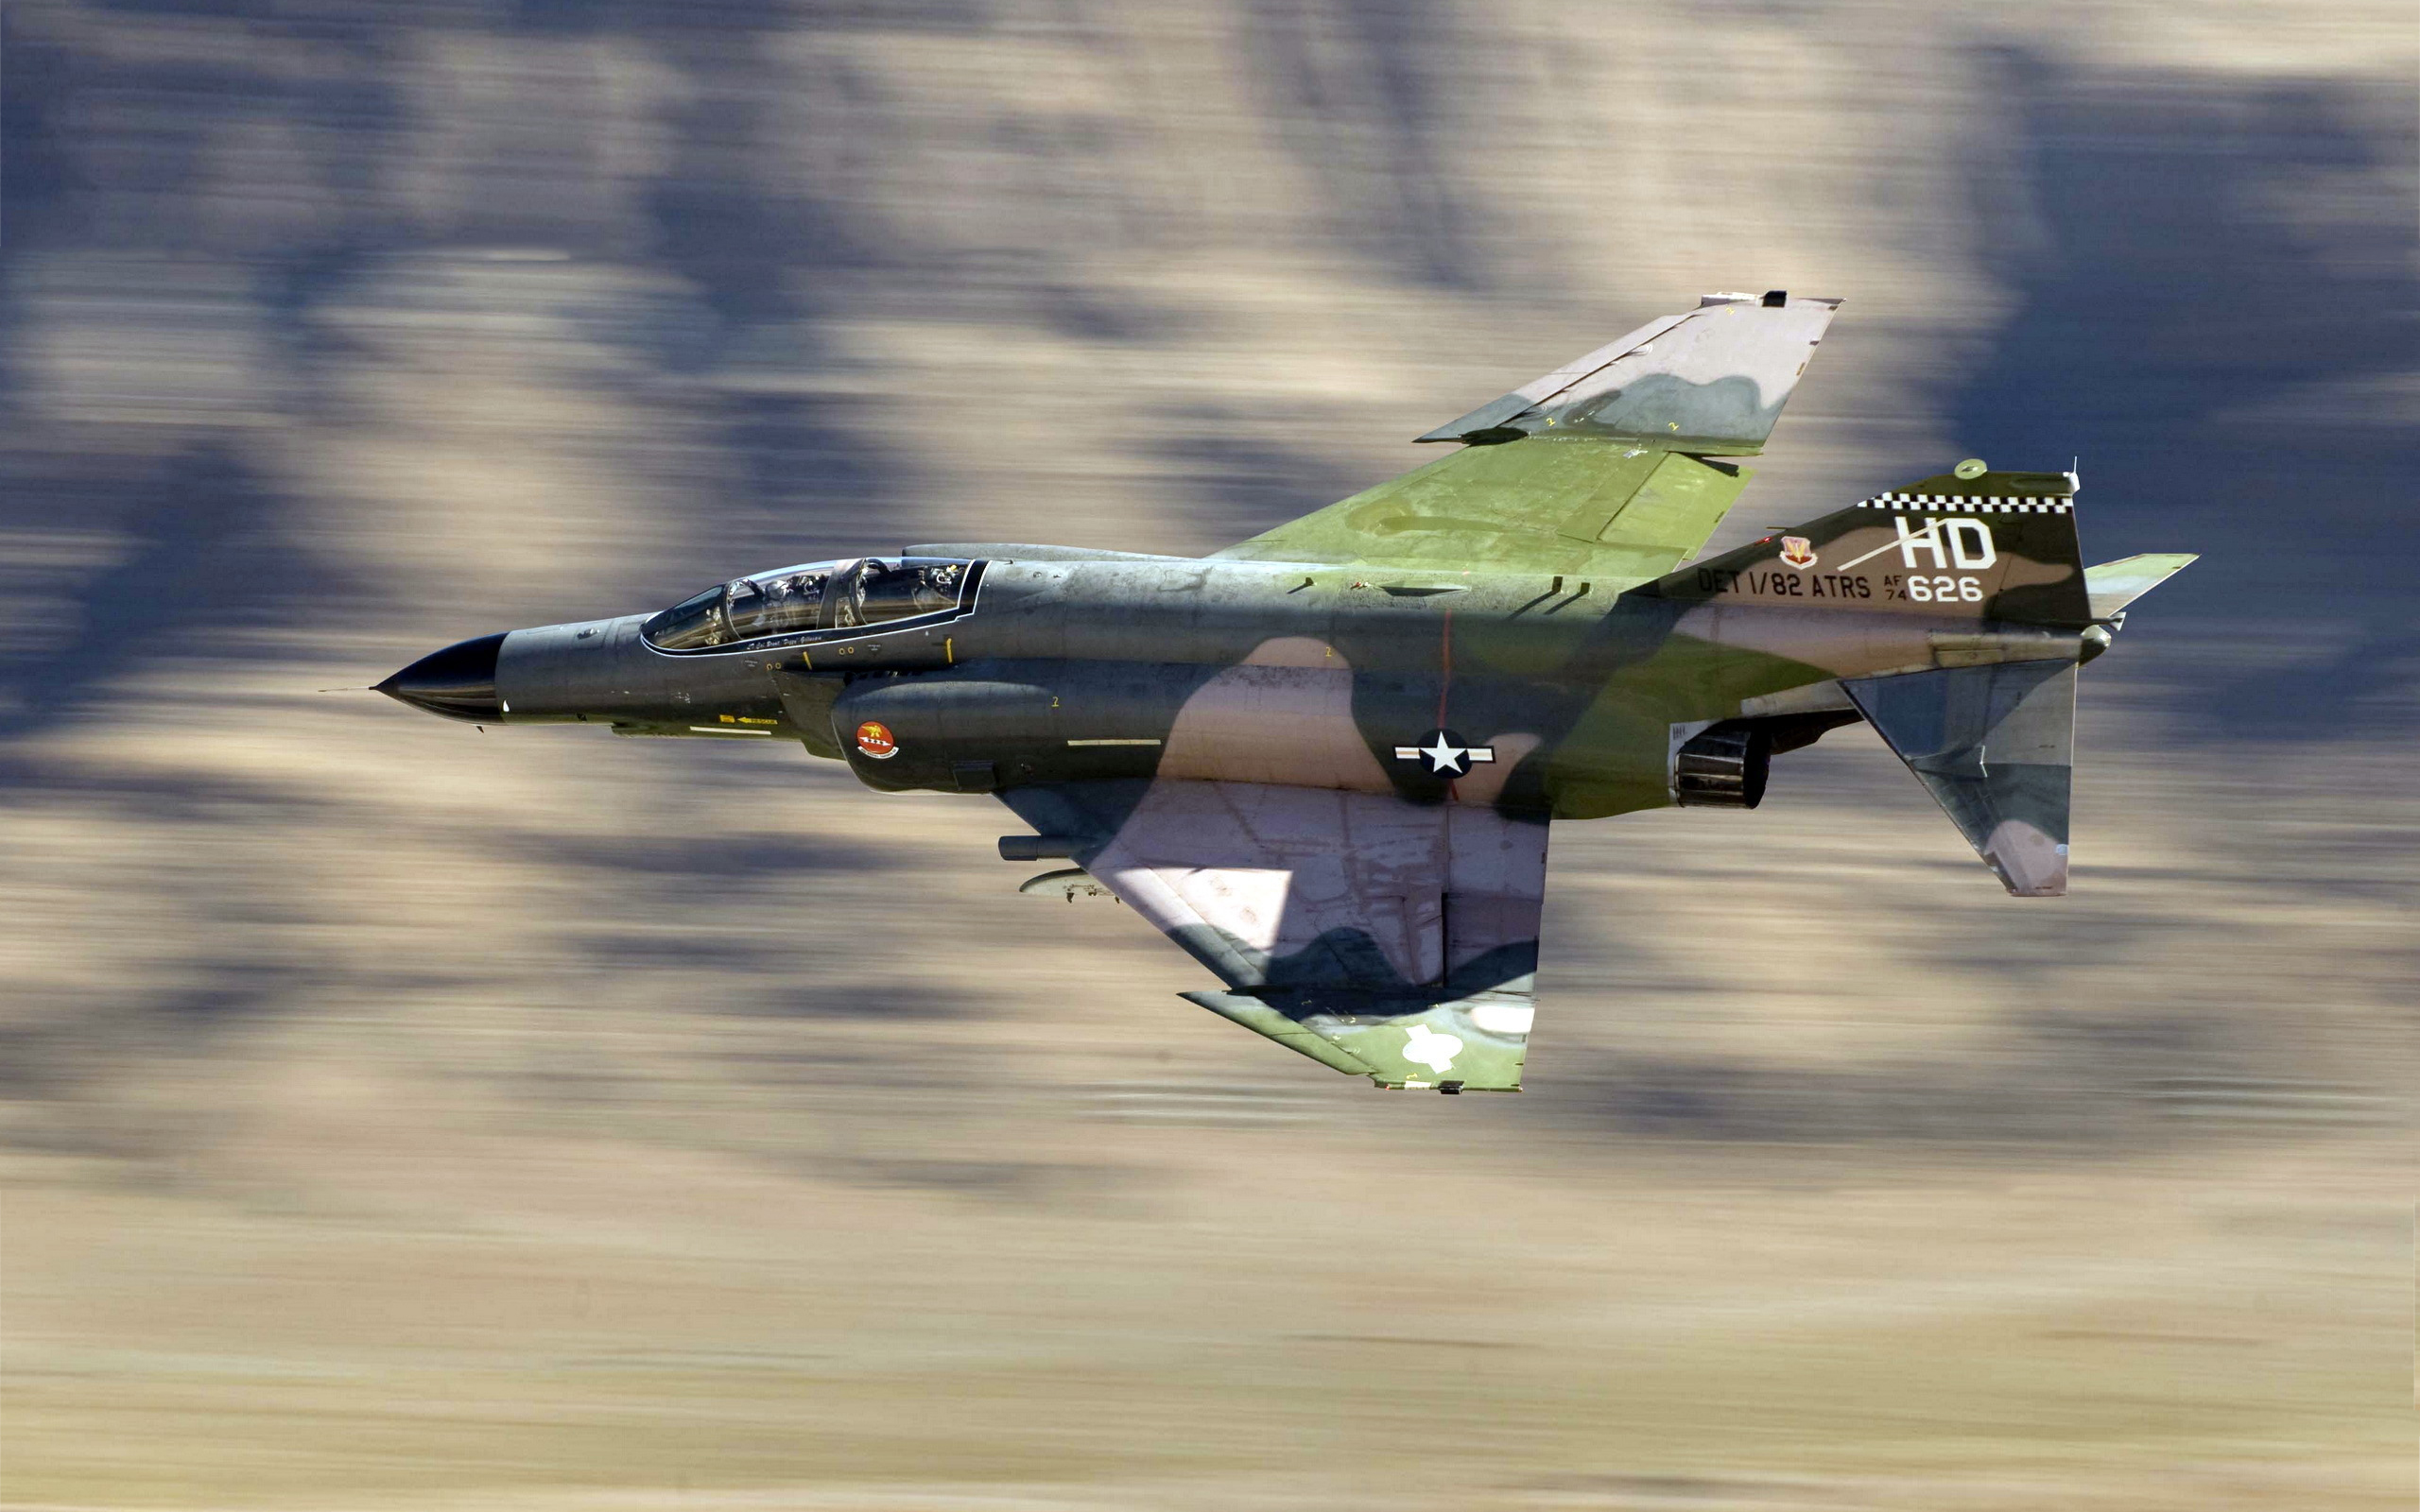 F4 jet fighter